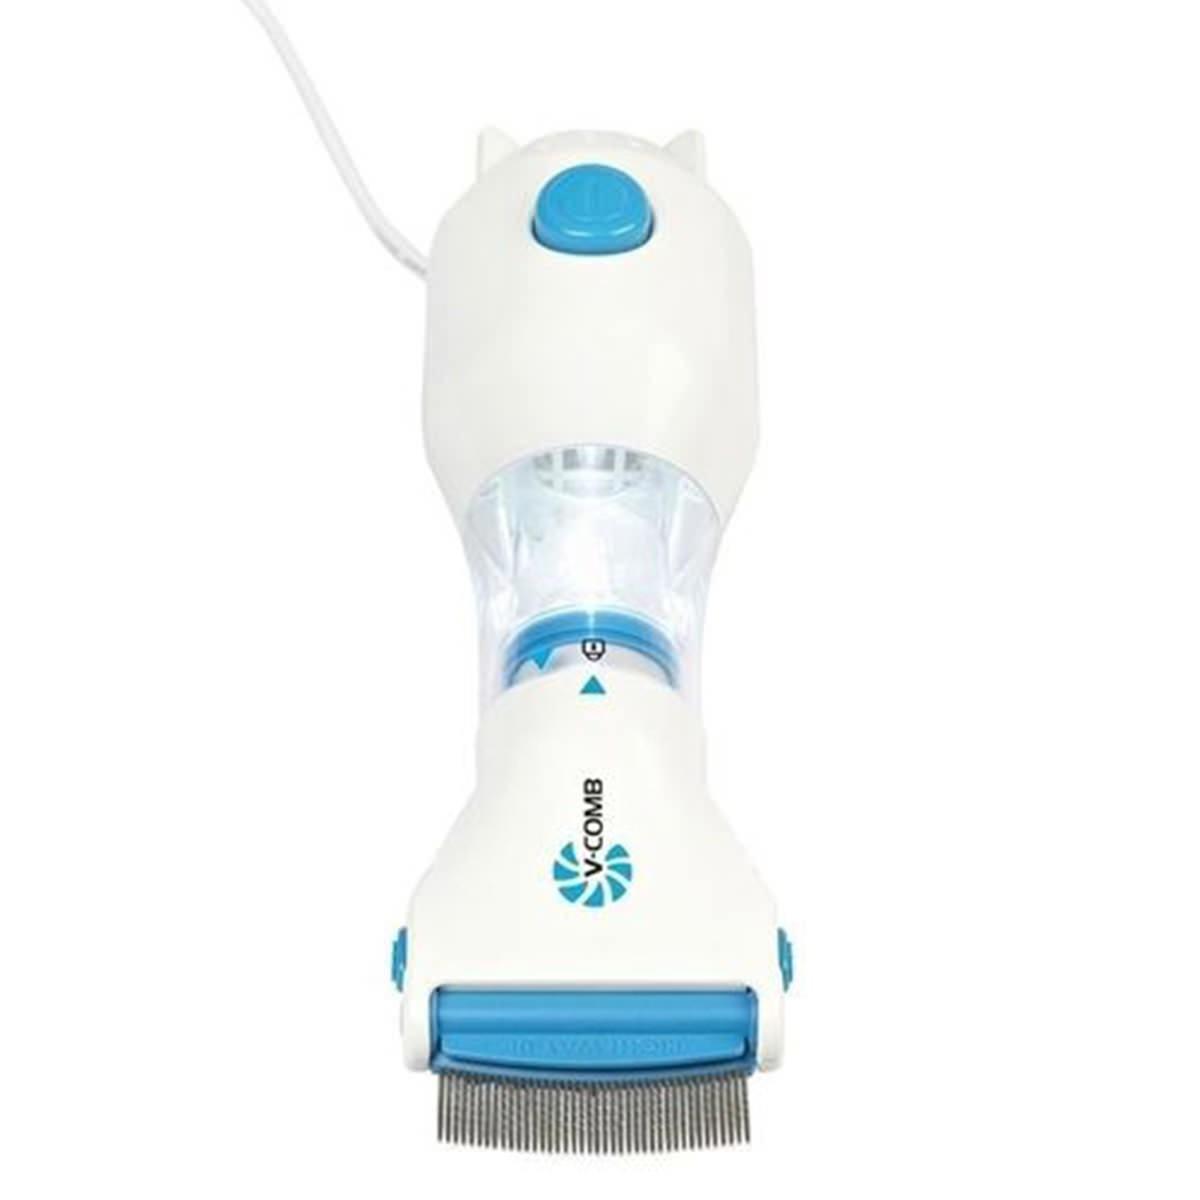 Beauty Health Products Online In Pakistan Prosil Hair Spa Green Tea 500 Anti Head Lice Solution Kit